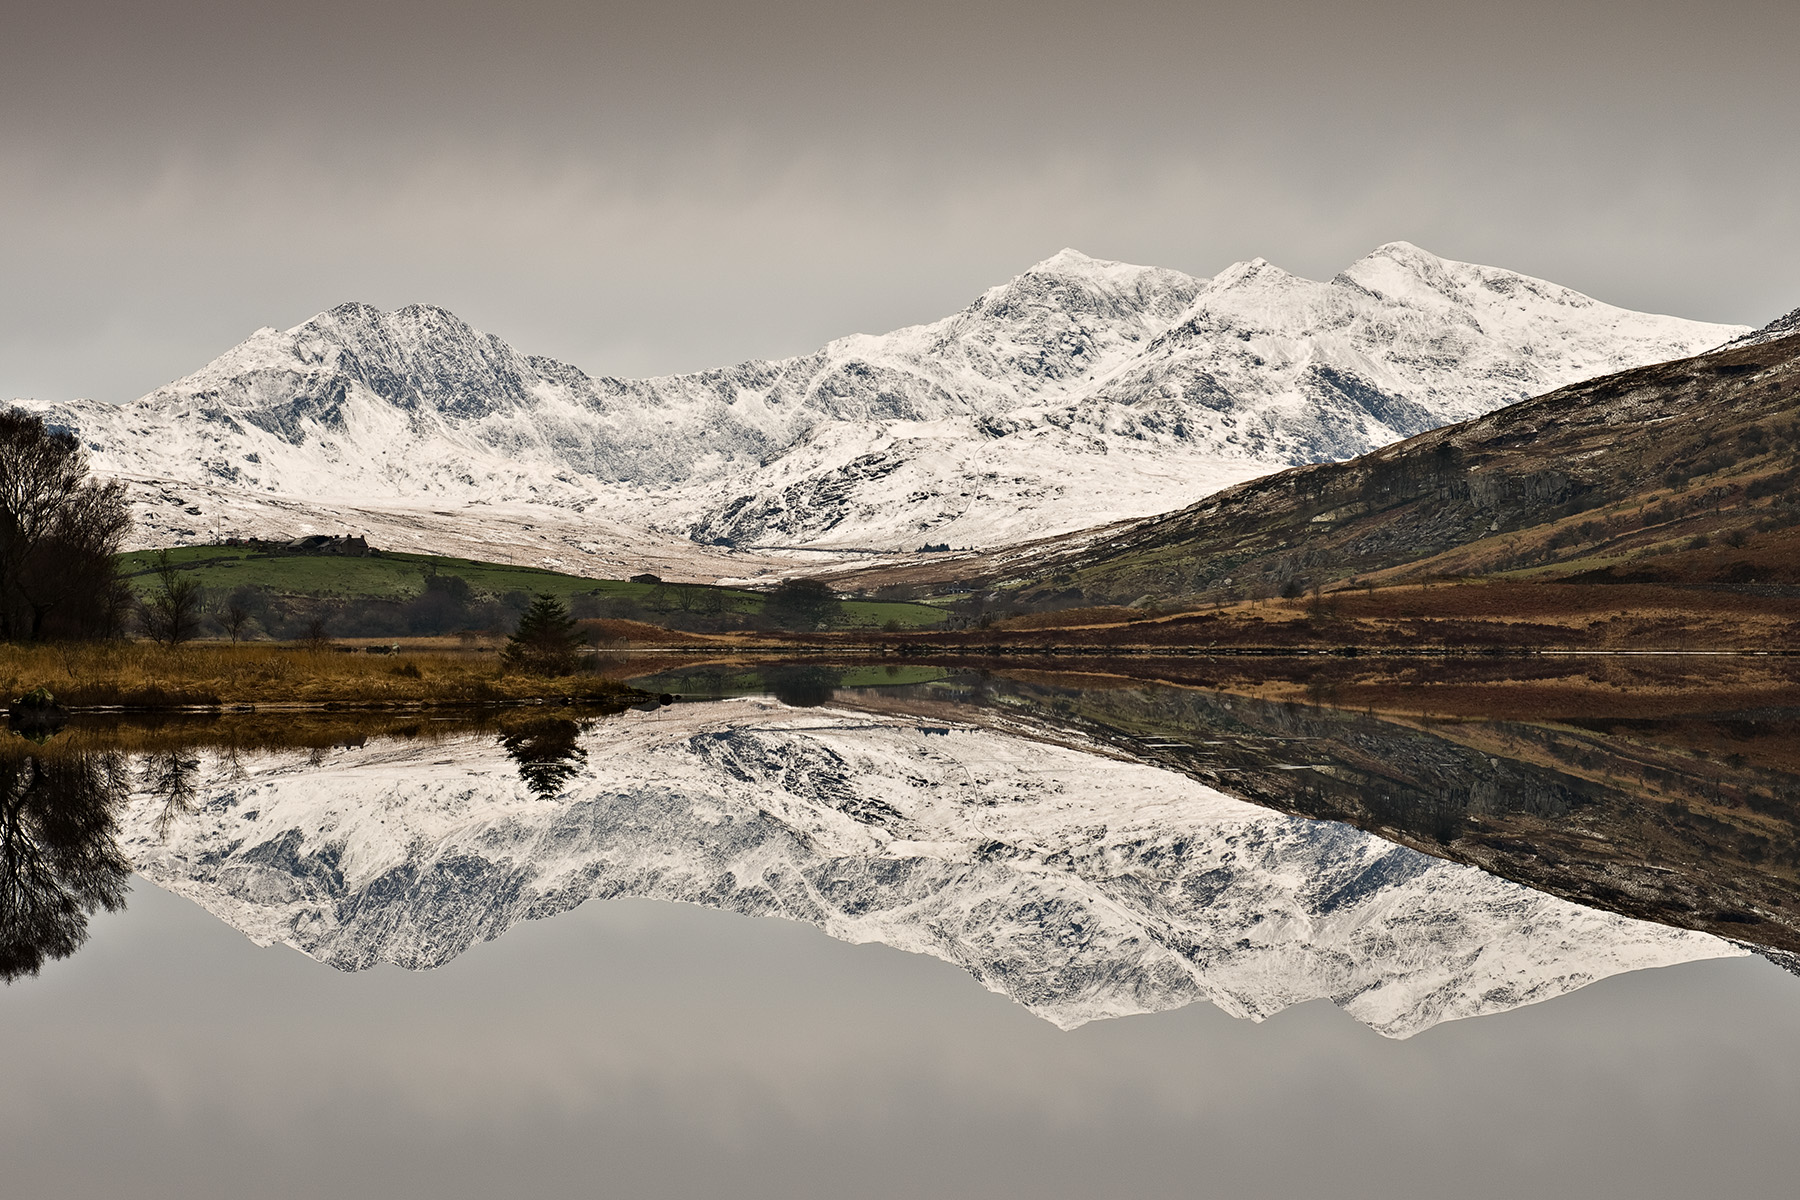 Wales's highest peak mirrored in Llynnau Mymbyr Pentax K5, Pentax 17-70 at 43mm, ISO80, 1/6s at f/11. Tripod. January. © Simon Kitchin